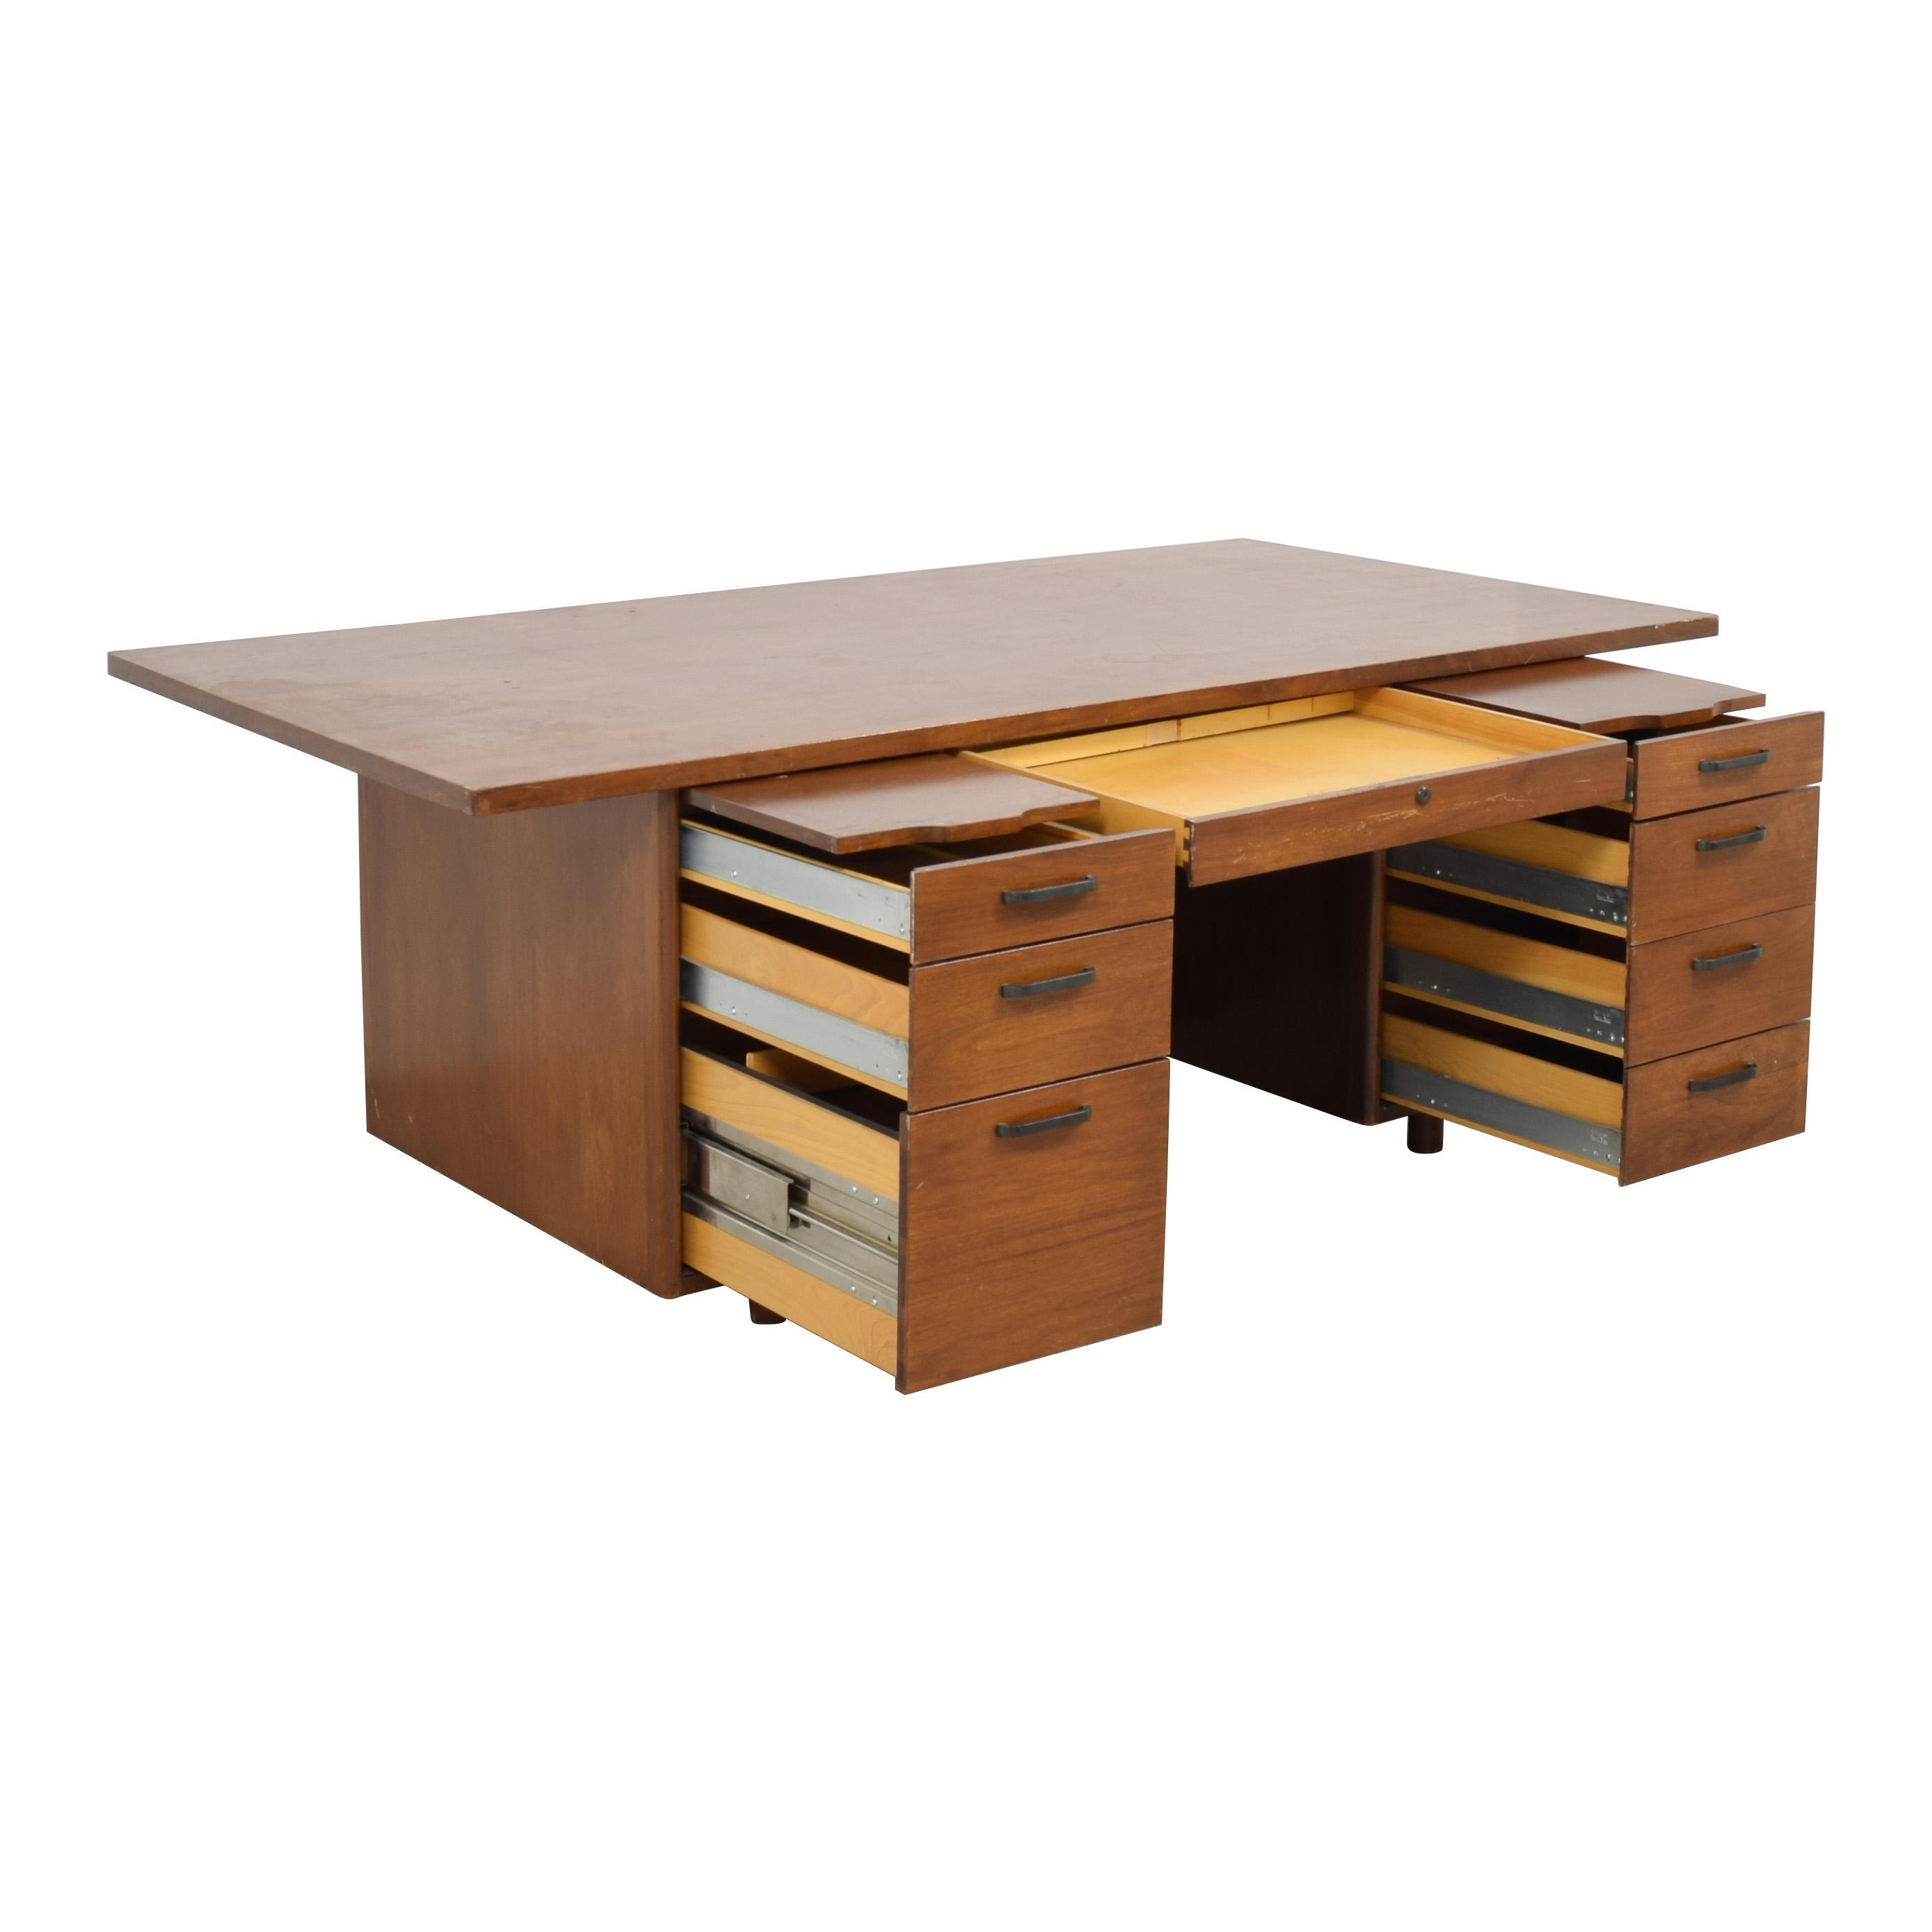 Standard Furniture Standard Furniture Executive Style Desk used